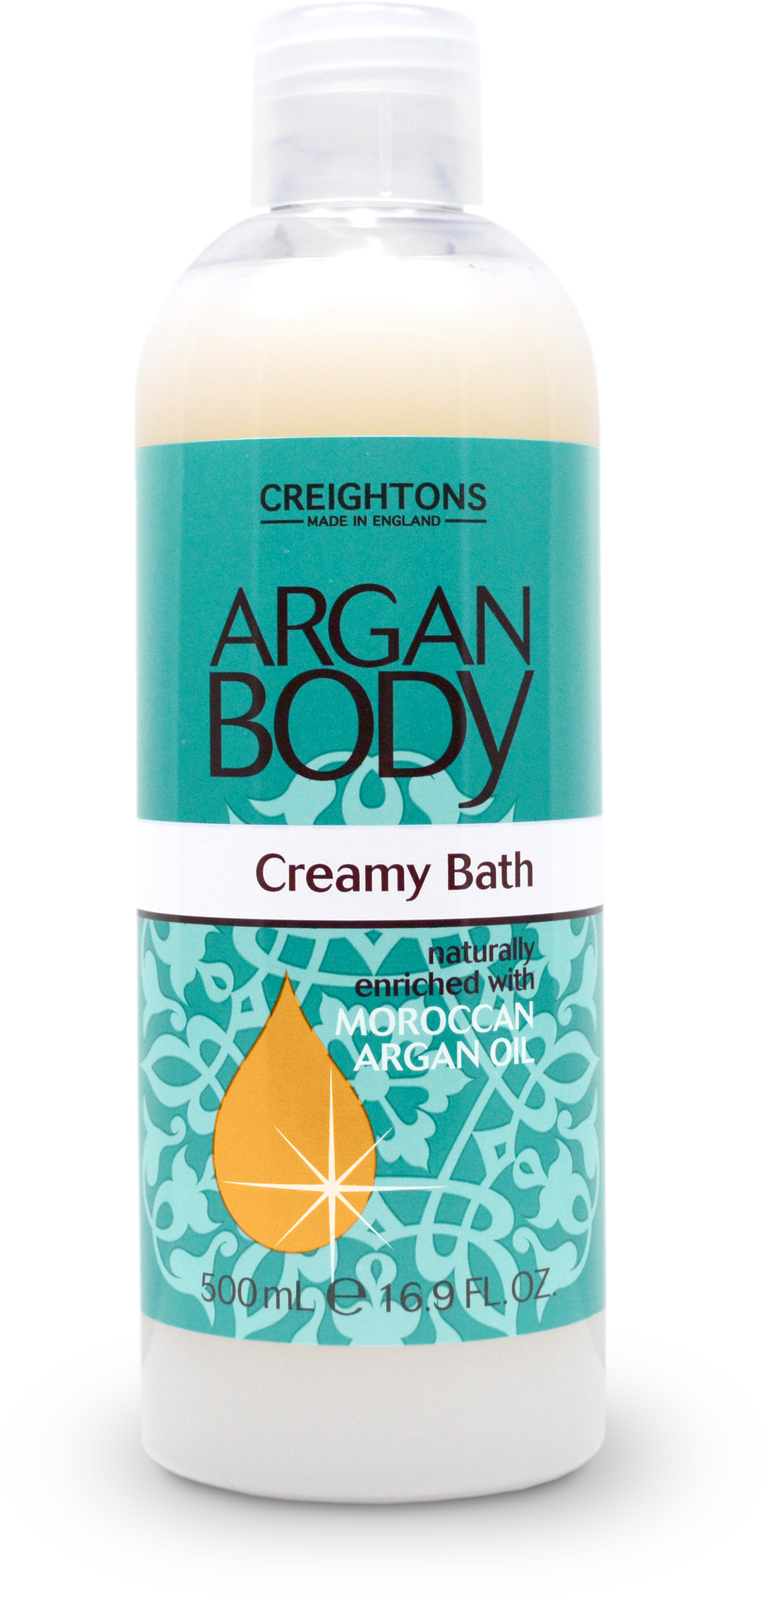 Creightons Argan Body Creamy Bath 500ml